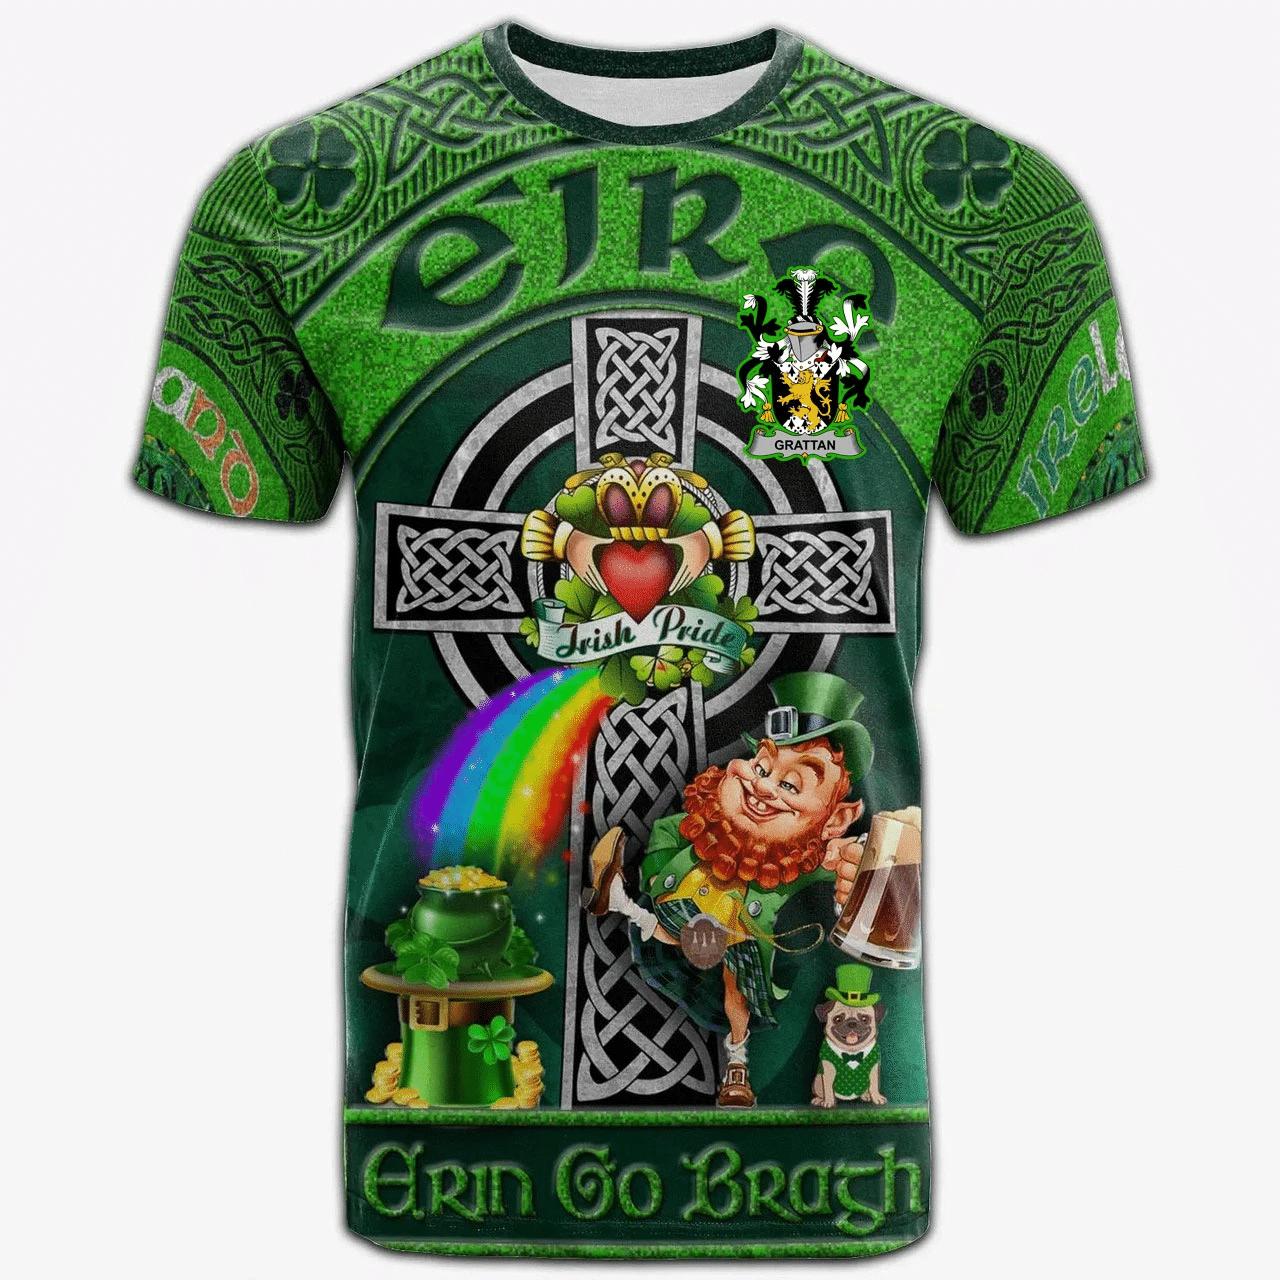 1stIreland Ireland T-Shirt - Grattan or McGrattan Crest Tee - Irish Shamrock with Claddagh Ring Cross A7